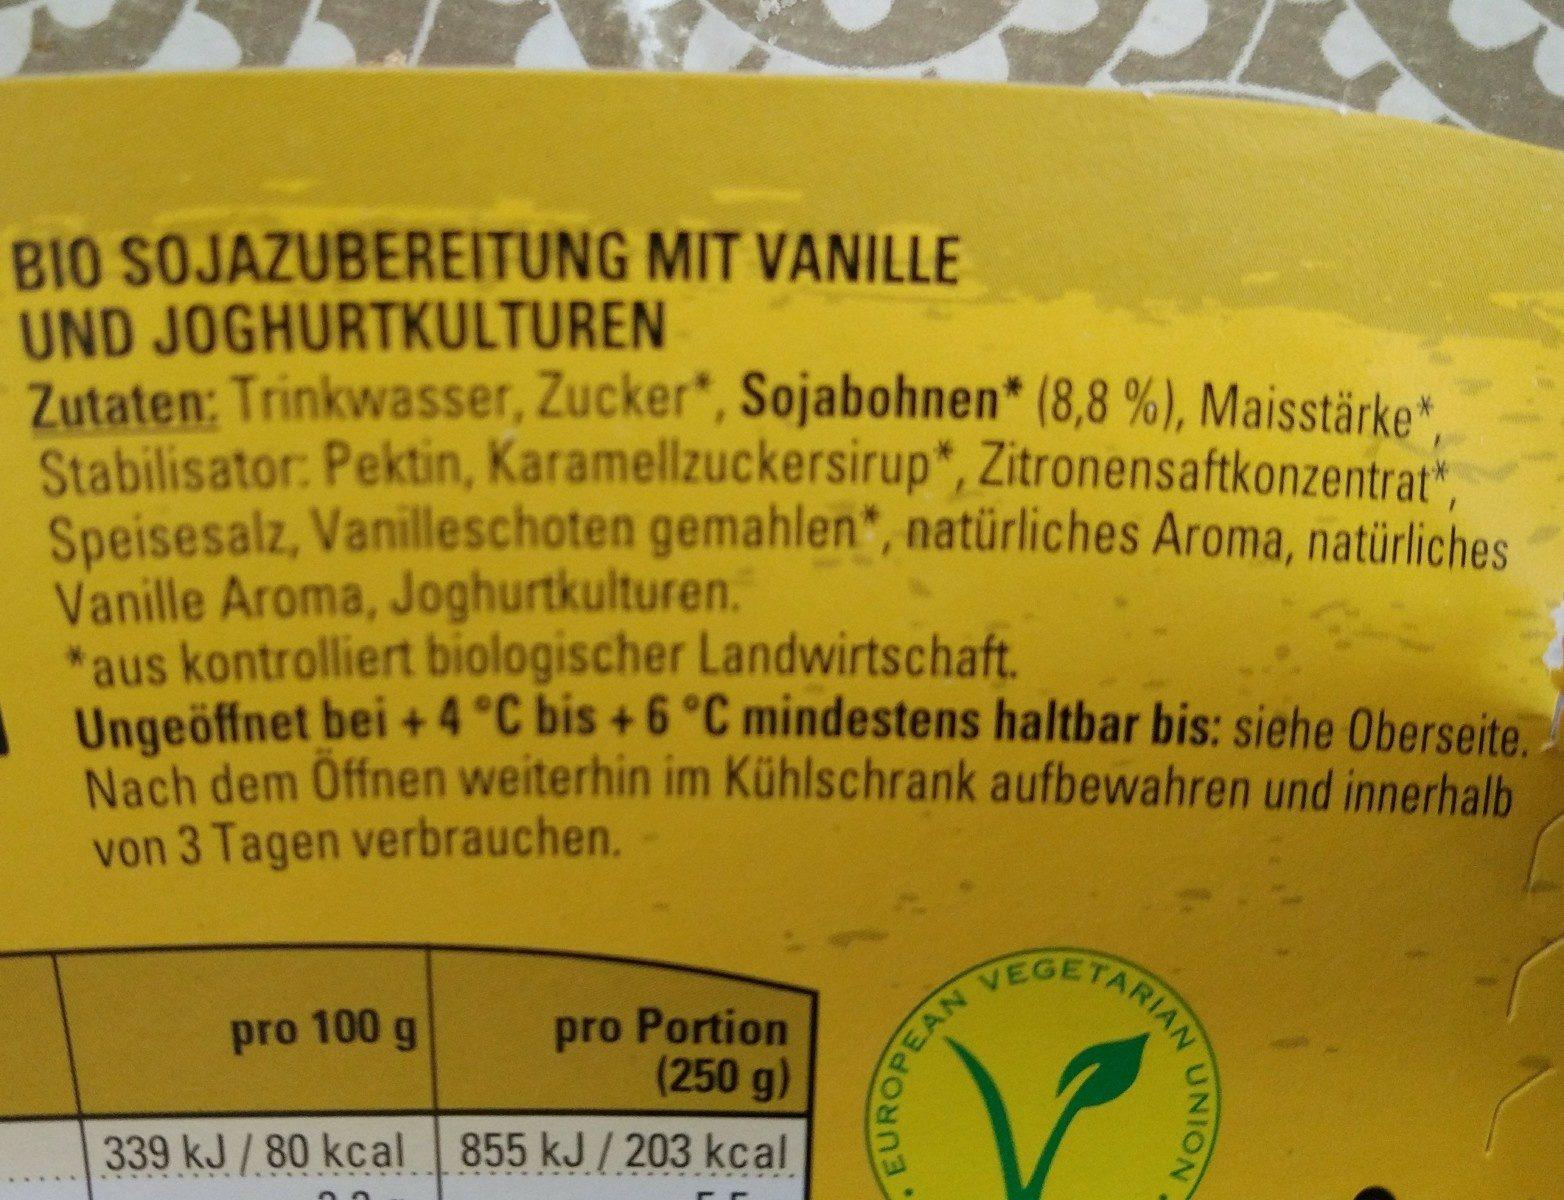 Veganer Bio Sojajoghurt Vanille - Ingrédients - fr